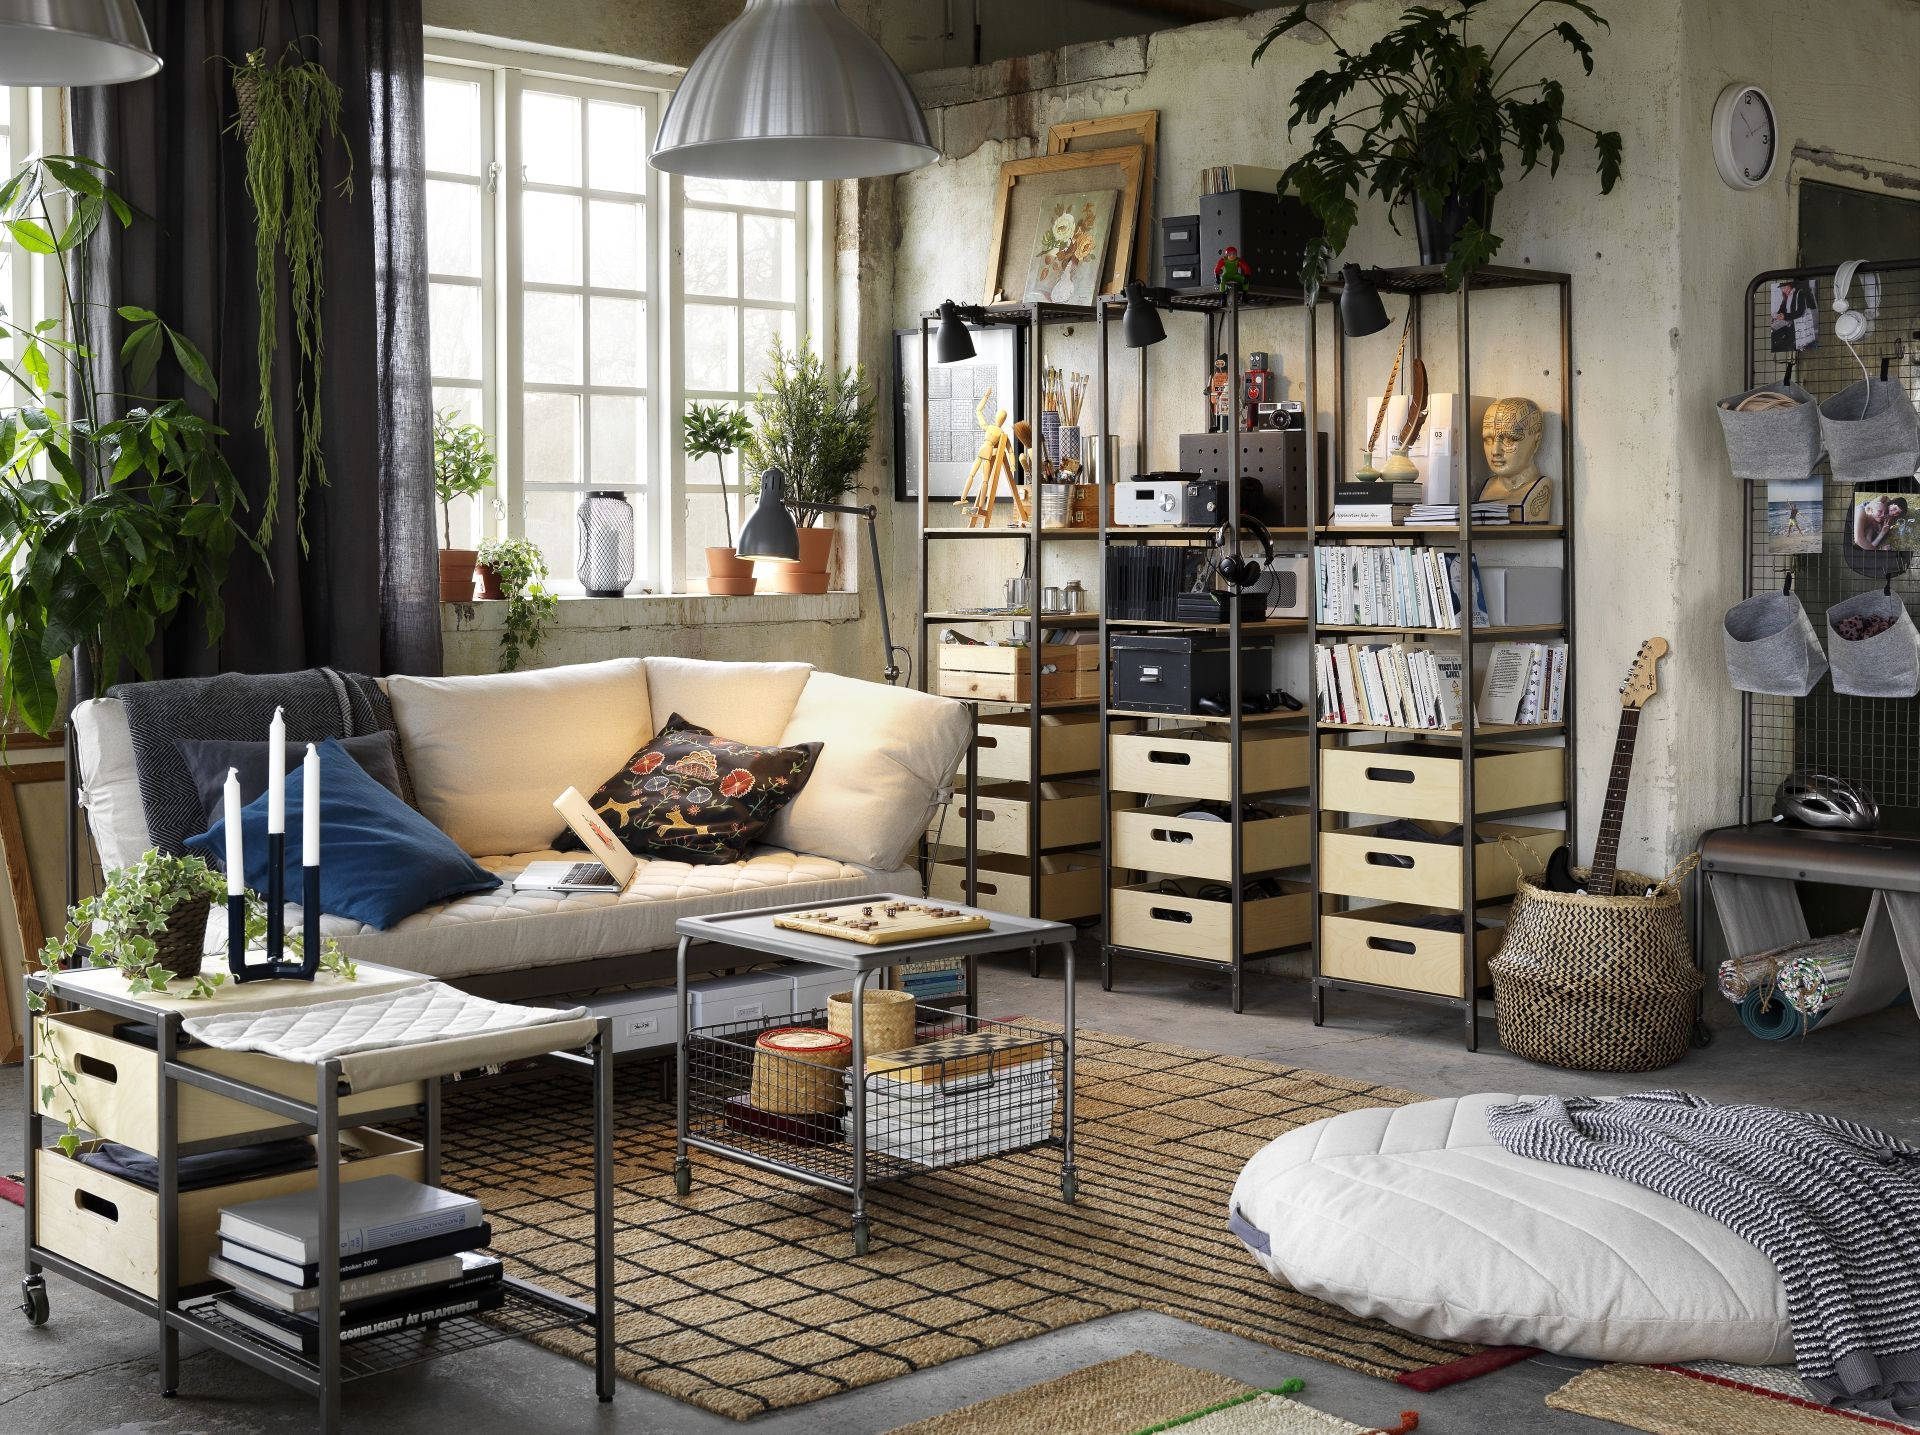 EKEBOL 3-zitsbank | IKEA IKEAnl IKEAnederland inspiratie ...